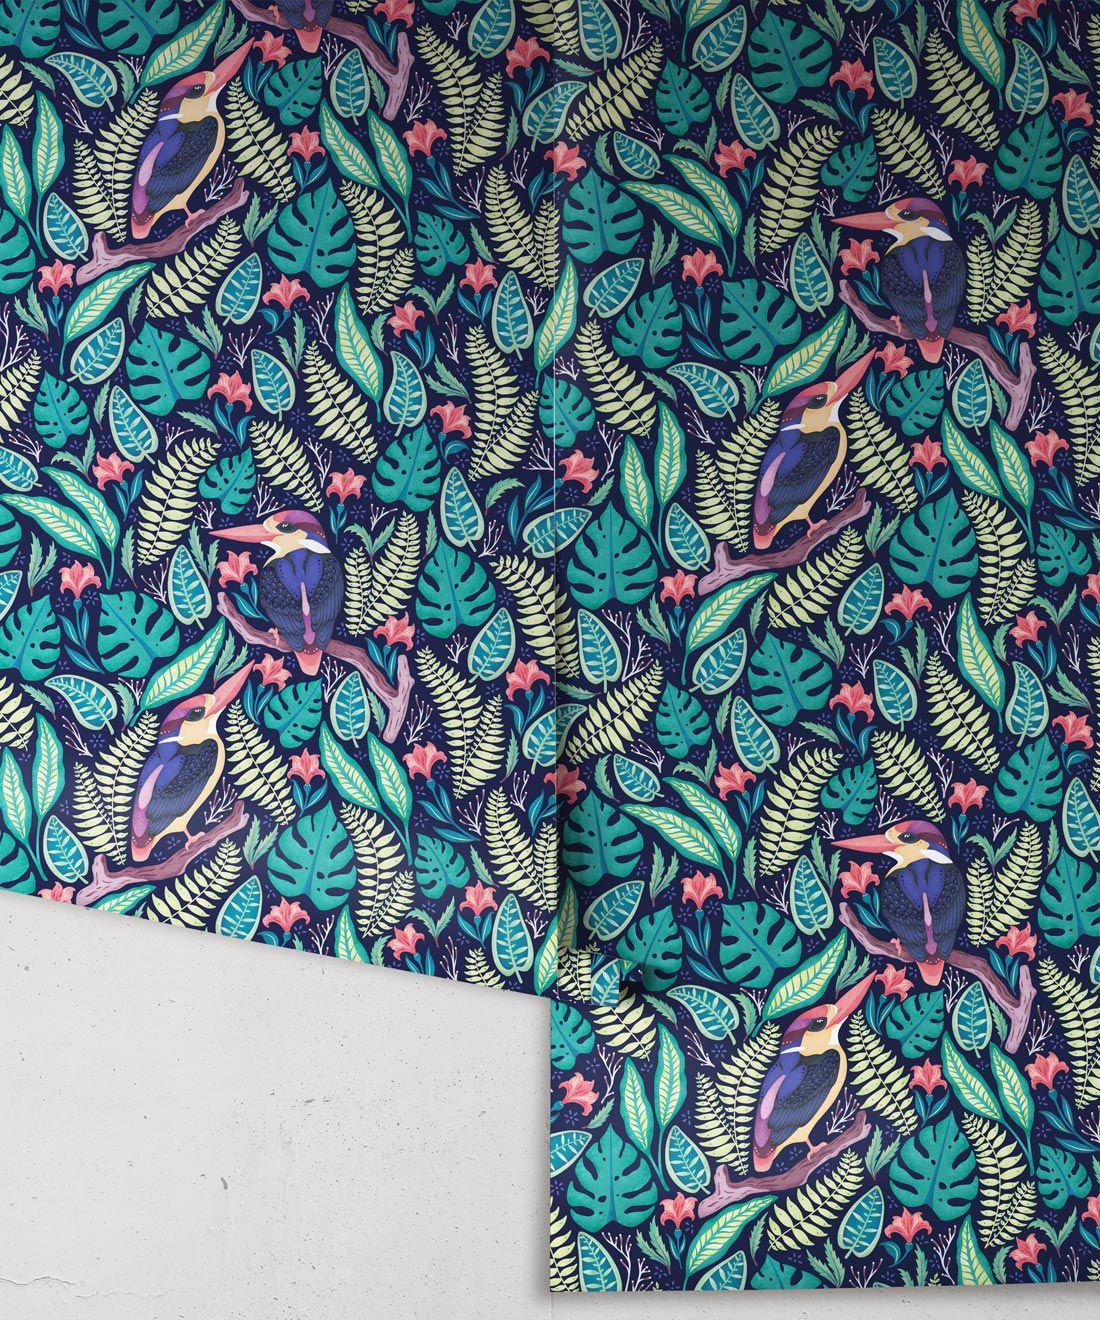 Kingfisher Wallpaper • Bird Wallpaper • Bright Neon Wallpaper Rolls